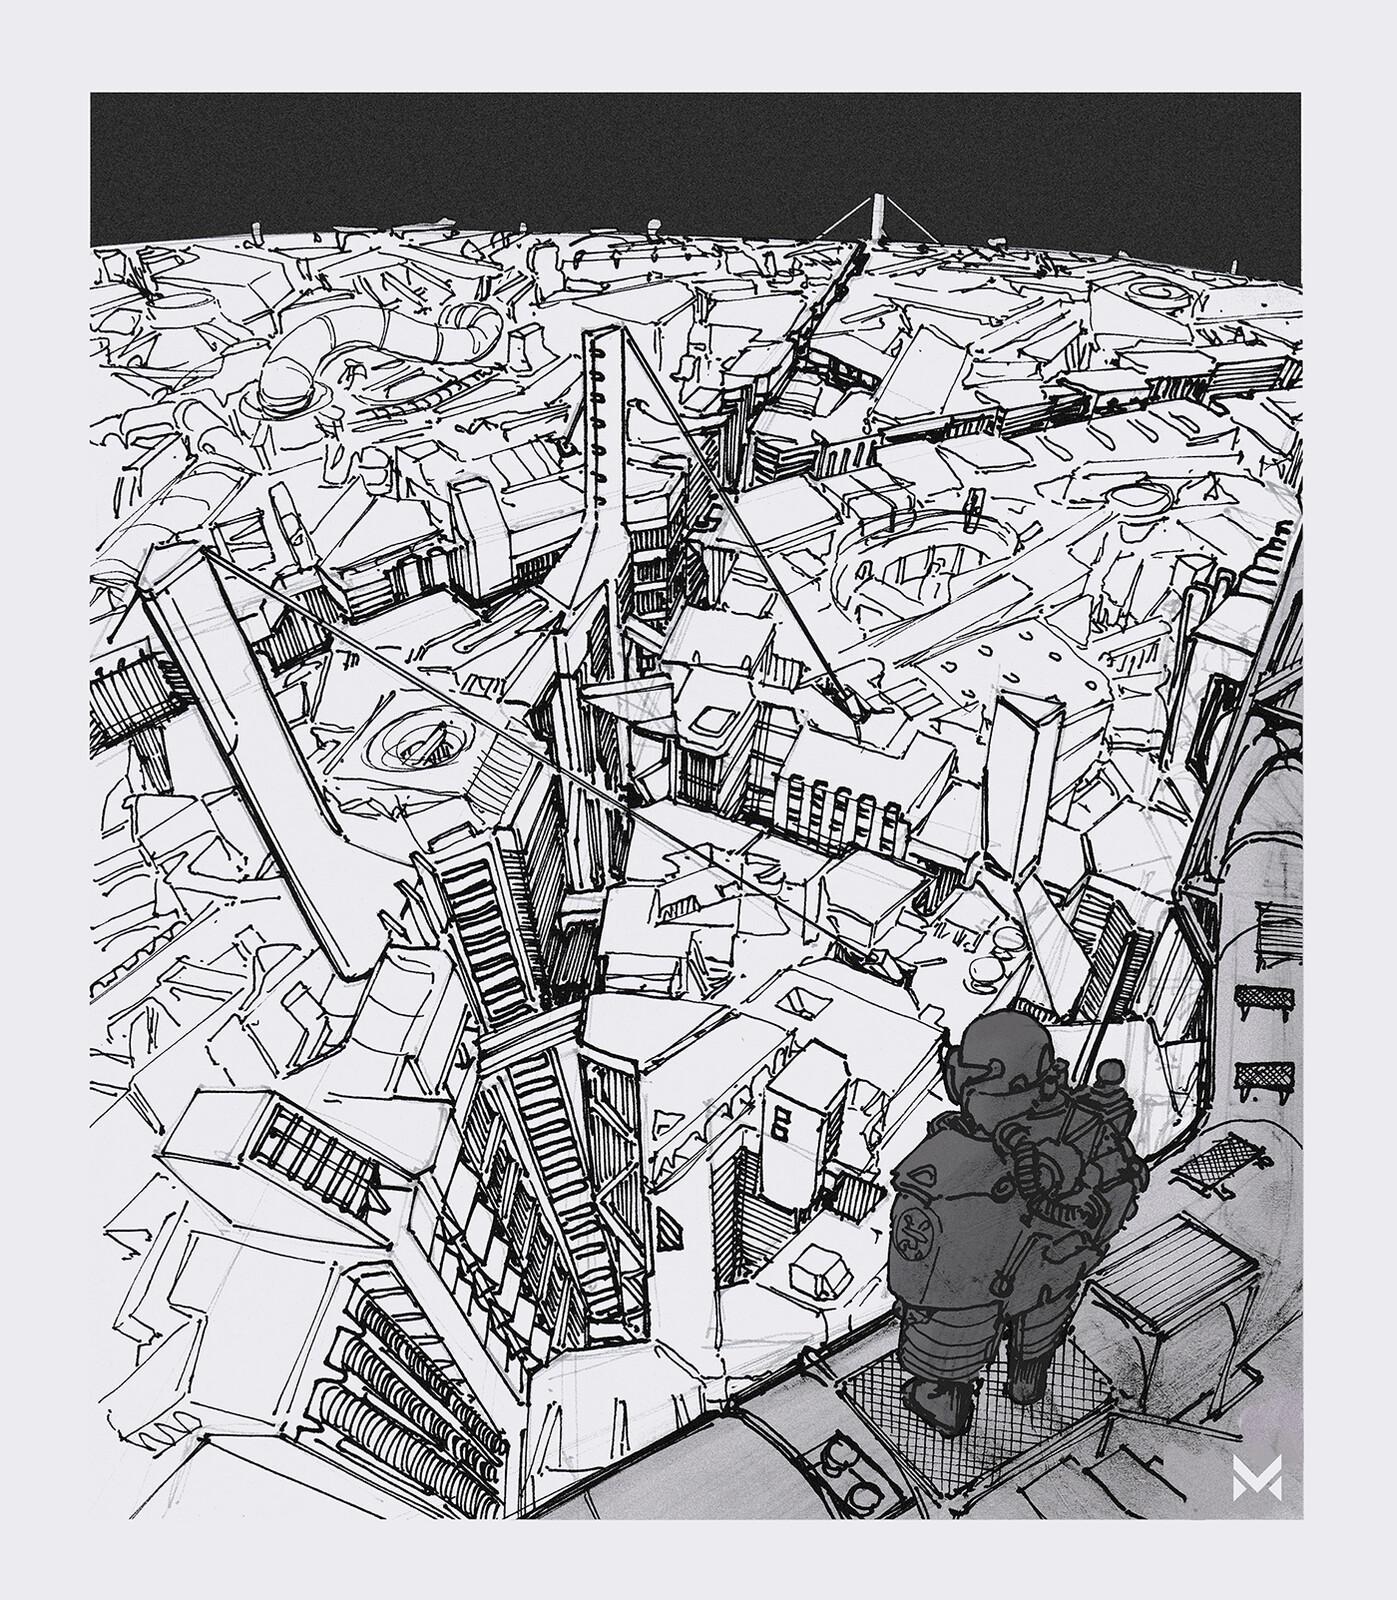 Megastructure-Venture  - inspired by Tsutomu Niheis manga epic 'Blame!'